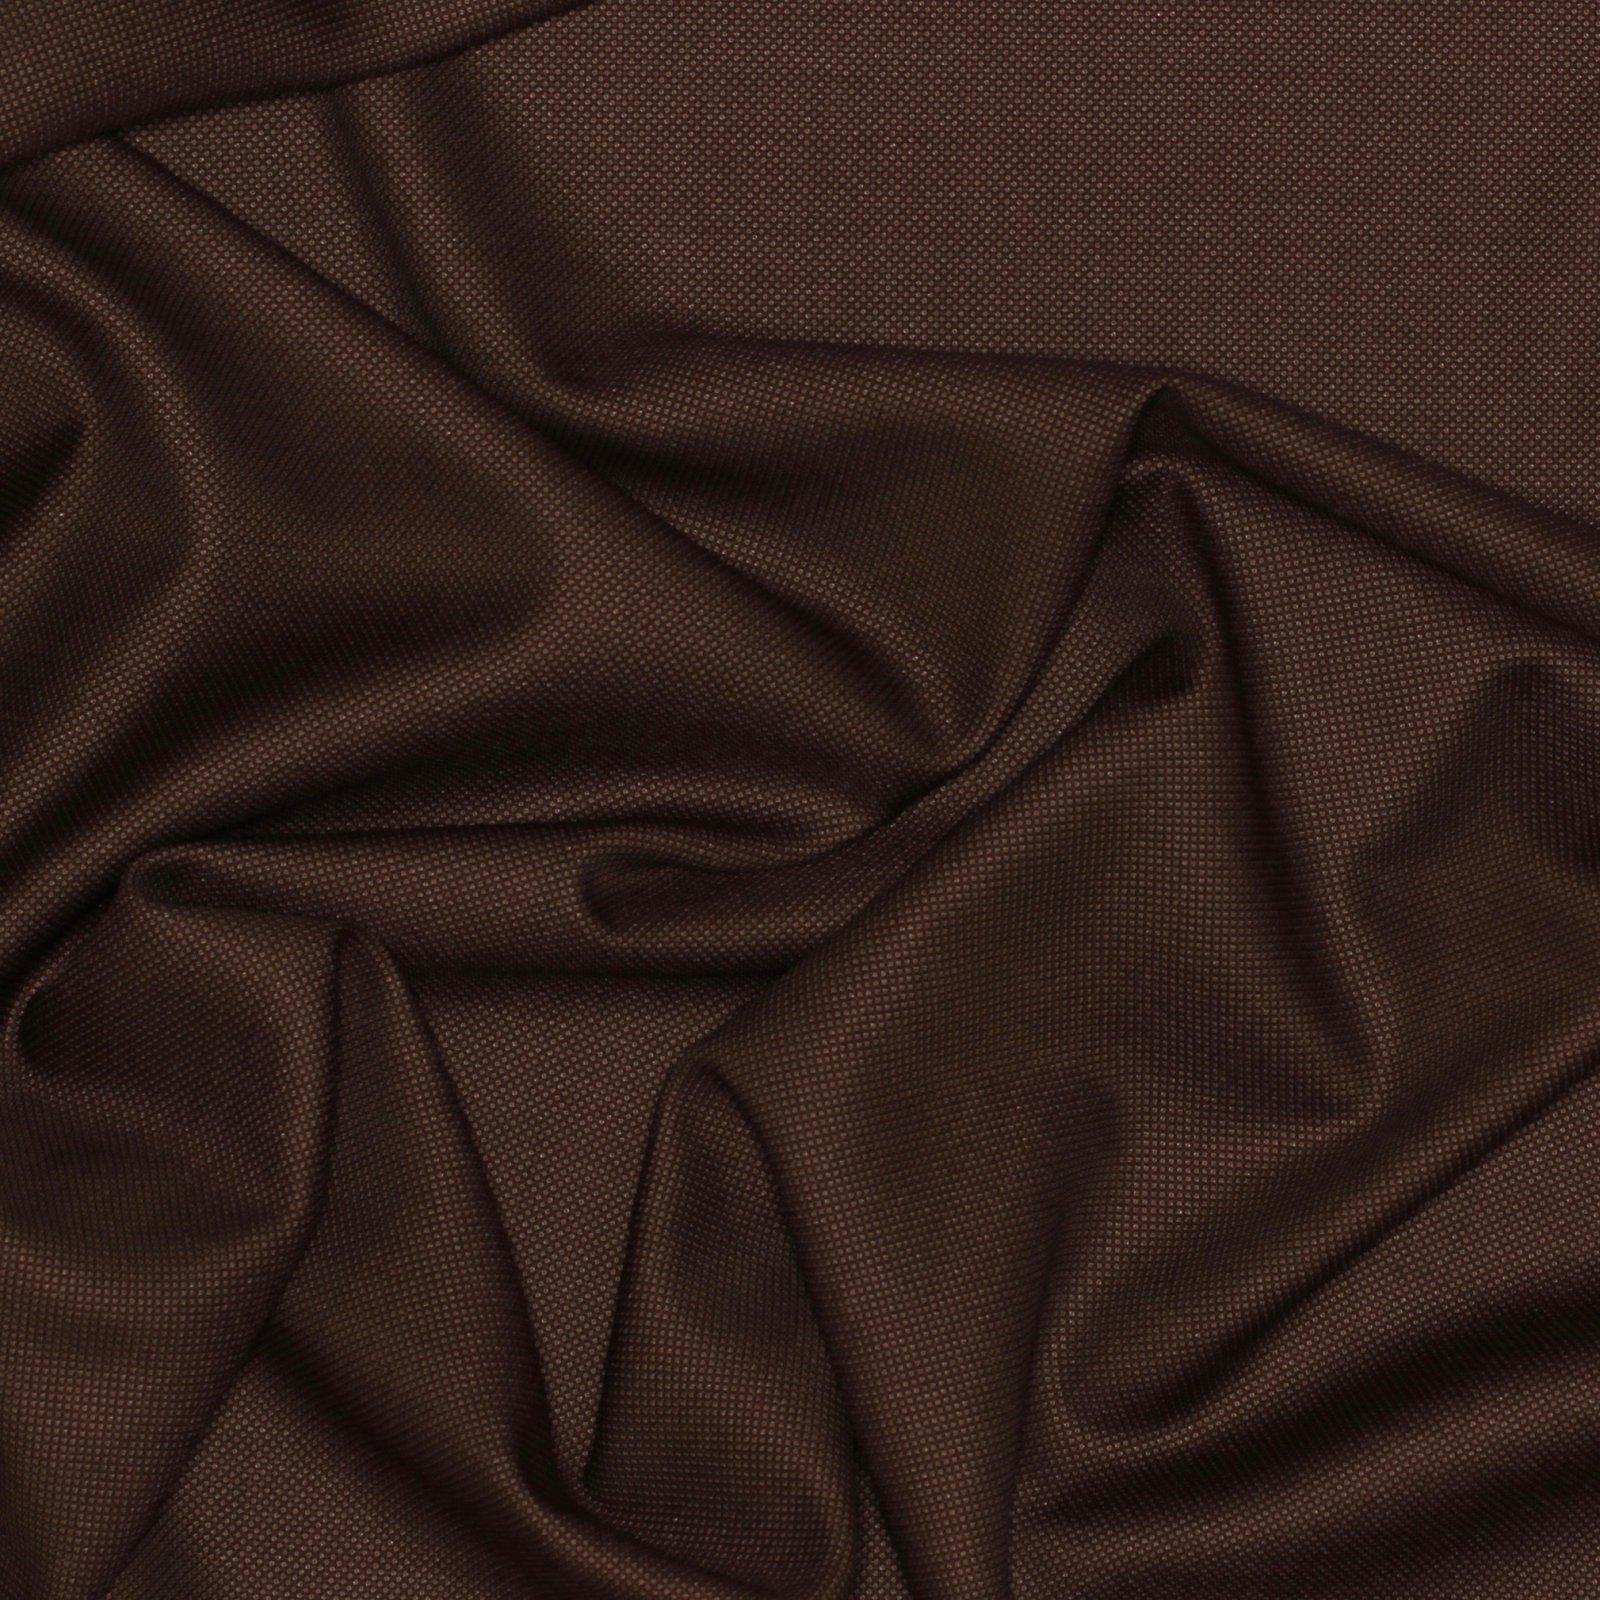 Umber Honeycomb Italian Wool/Silk Blend; 60